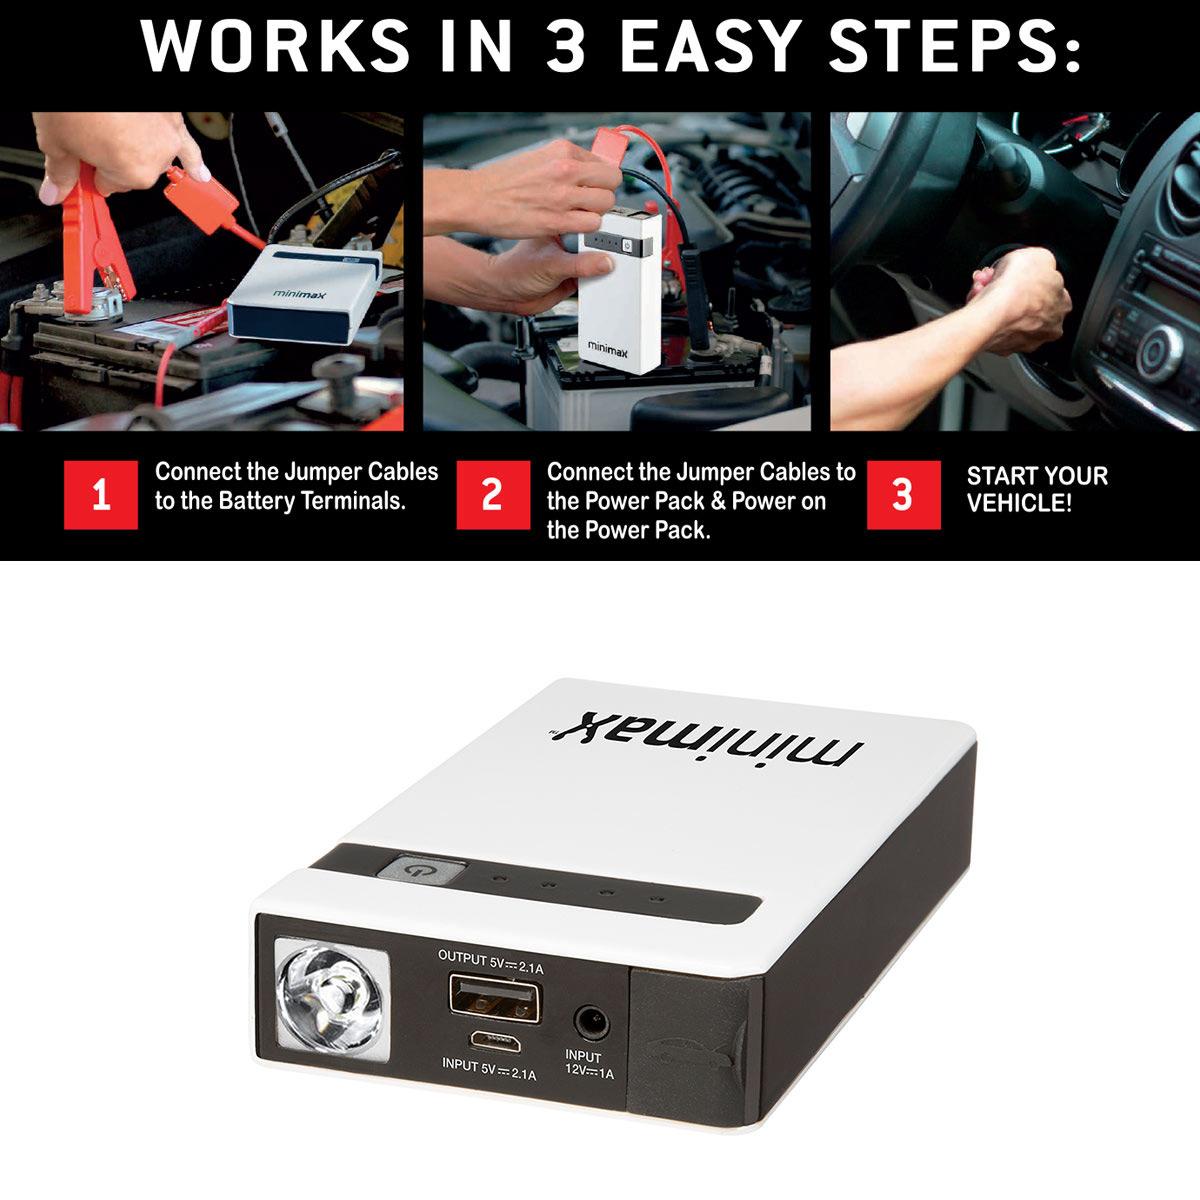 MiniMax Power Pack